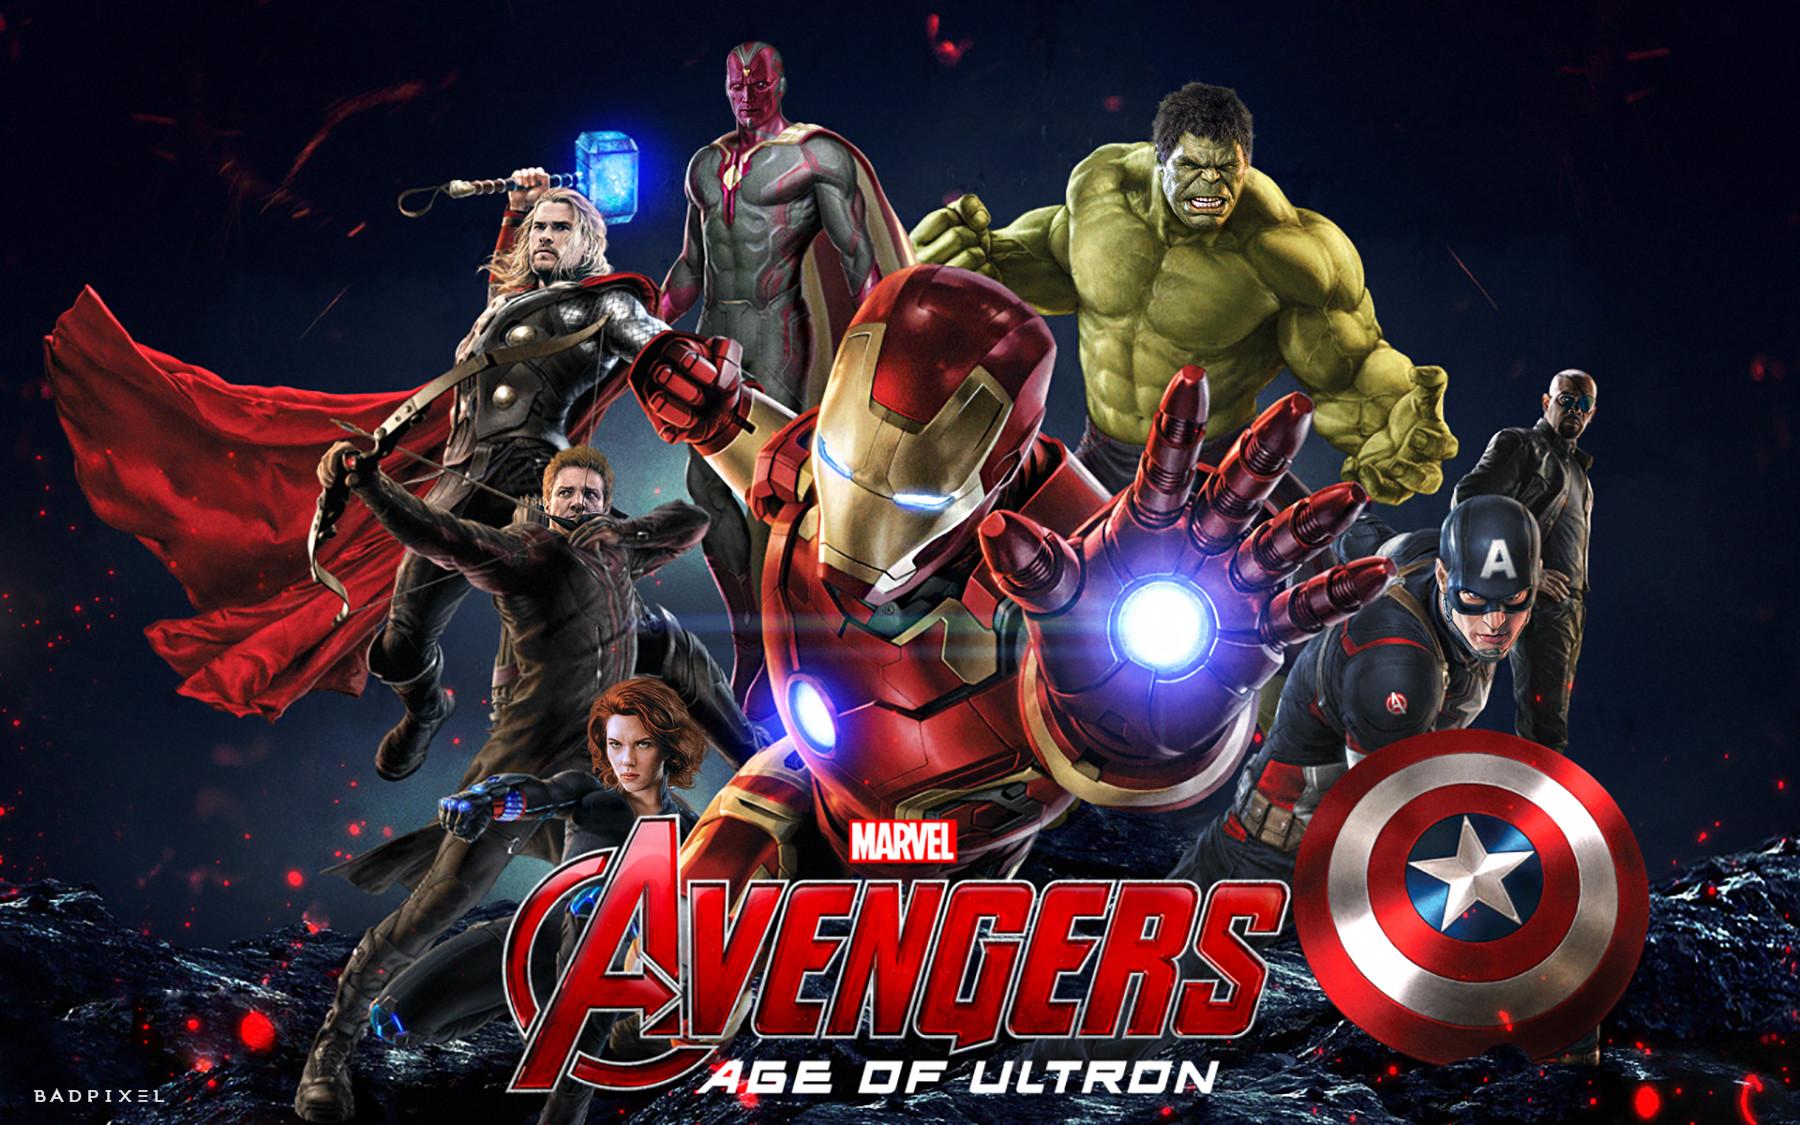 Iron man avengers age of ultron wallpaper 2018 in iron man.